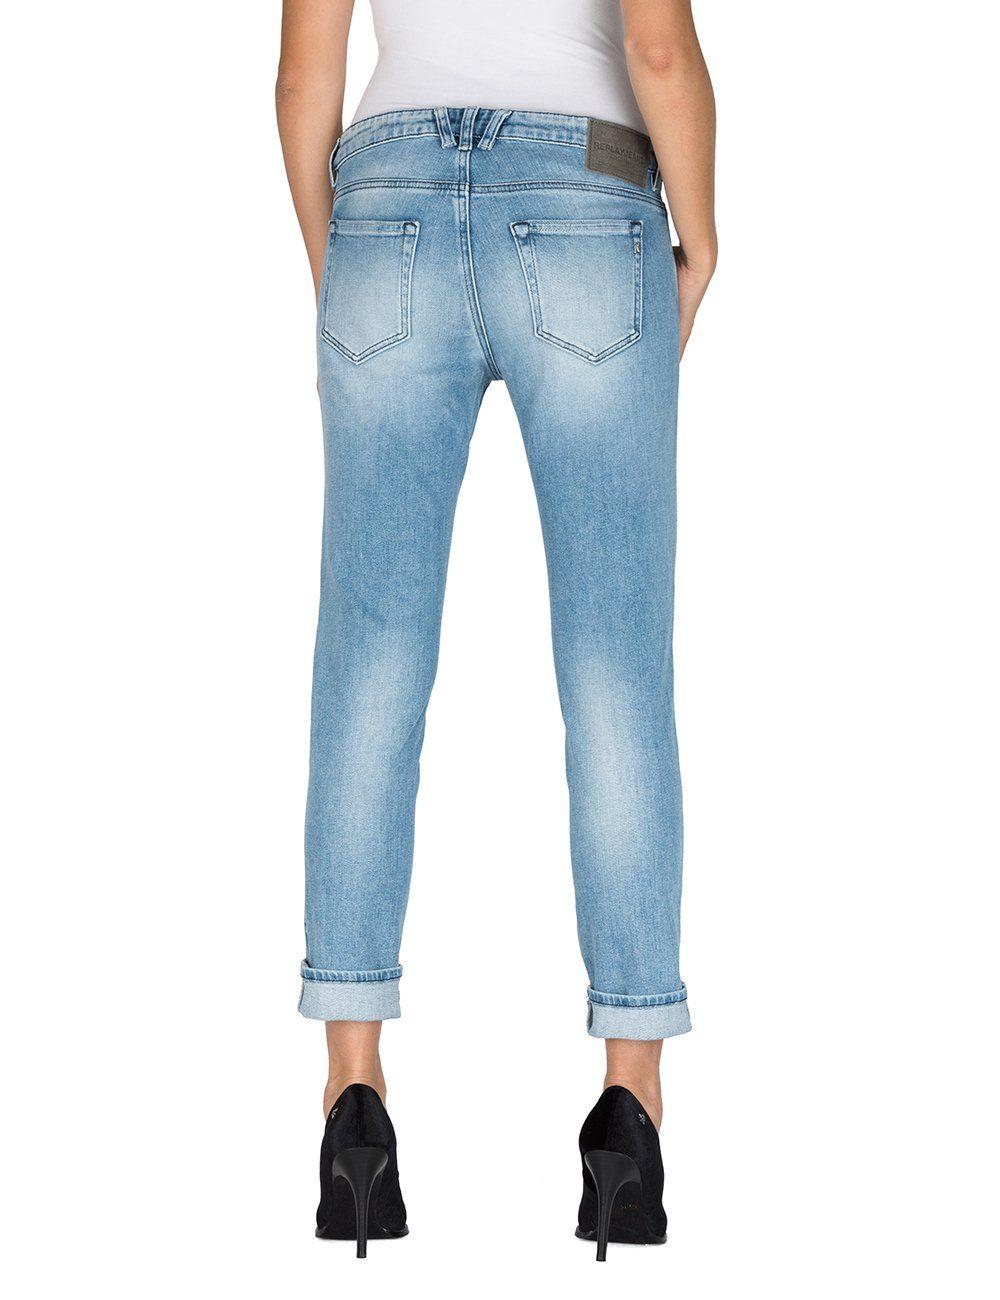 Online Replay Fit Jeans »katewin«Slim Kaufen SzMVUqp